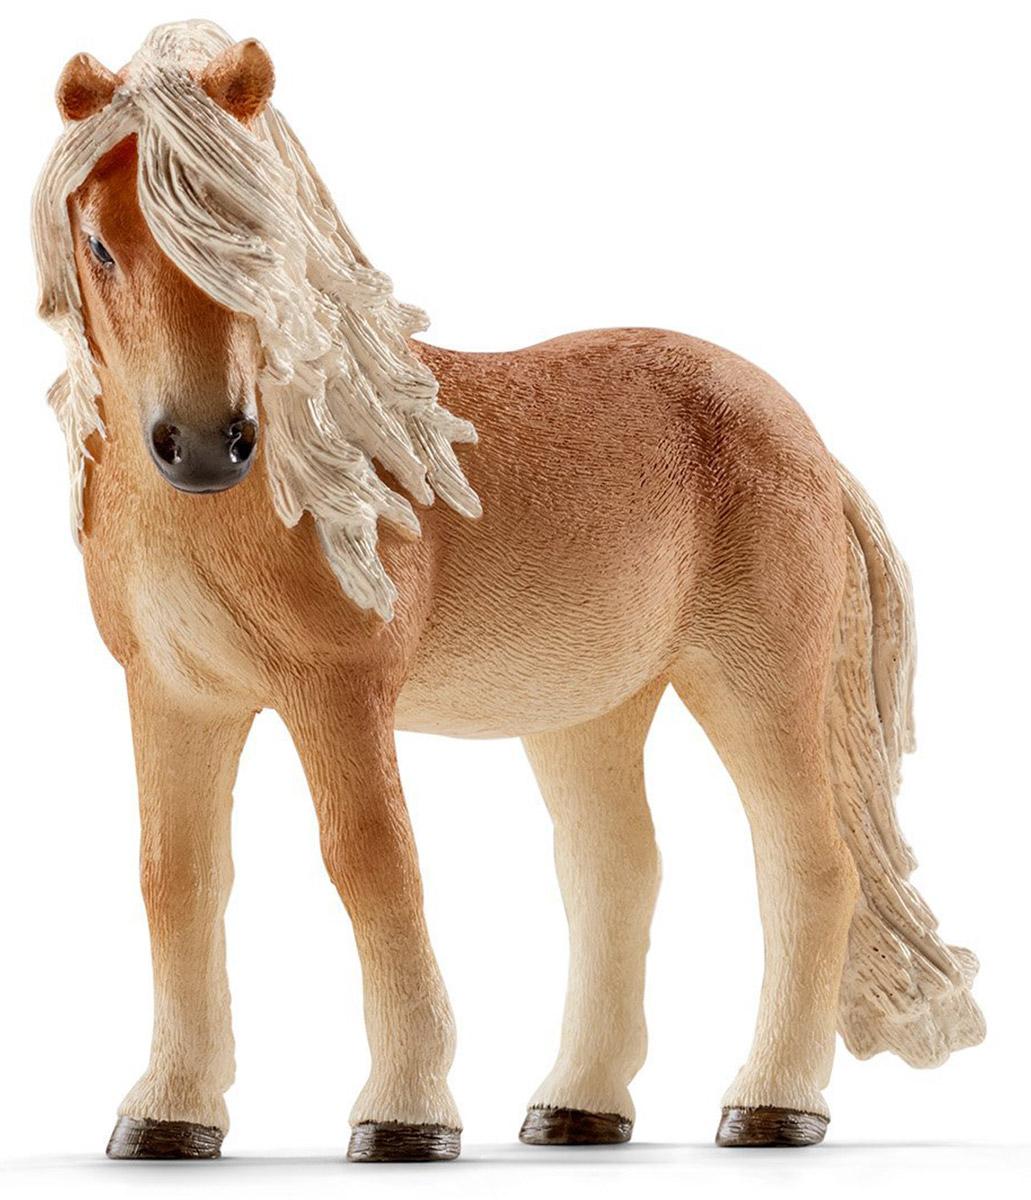 Schleich Фигурка Исландская кобыла schleich конюх и исландский пони